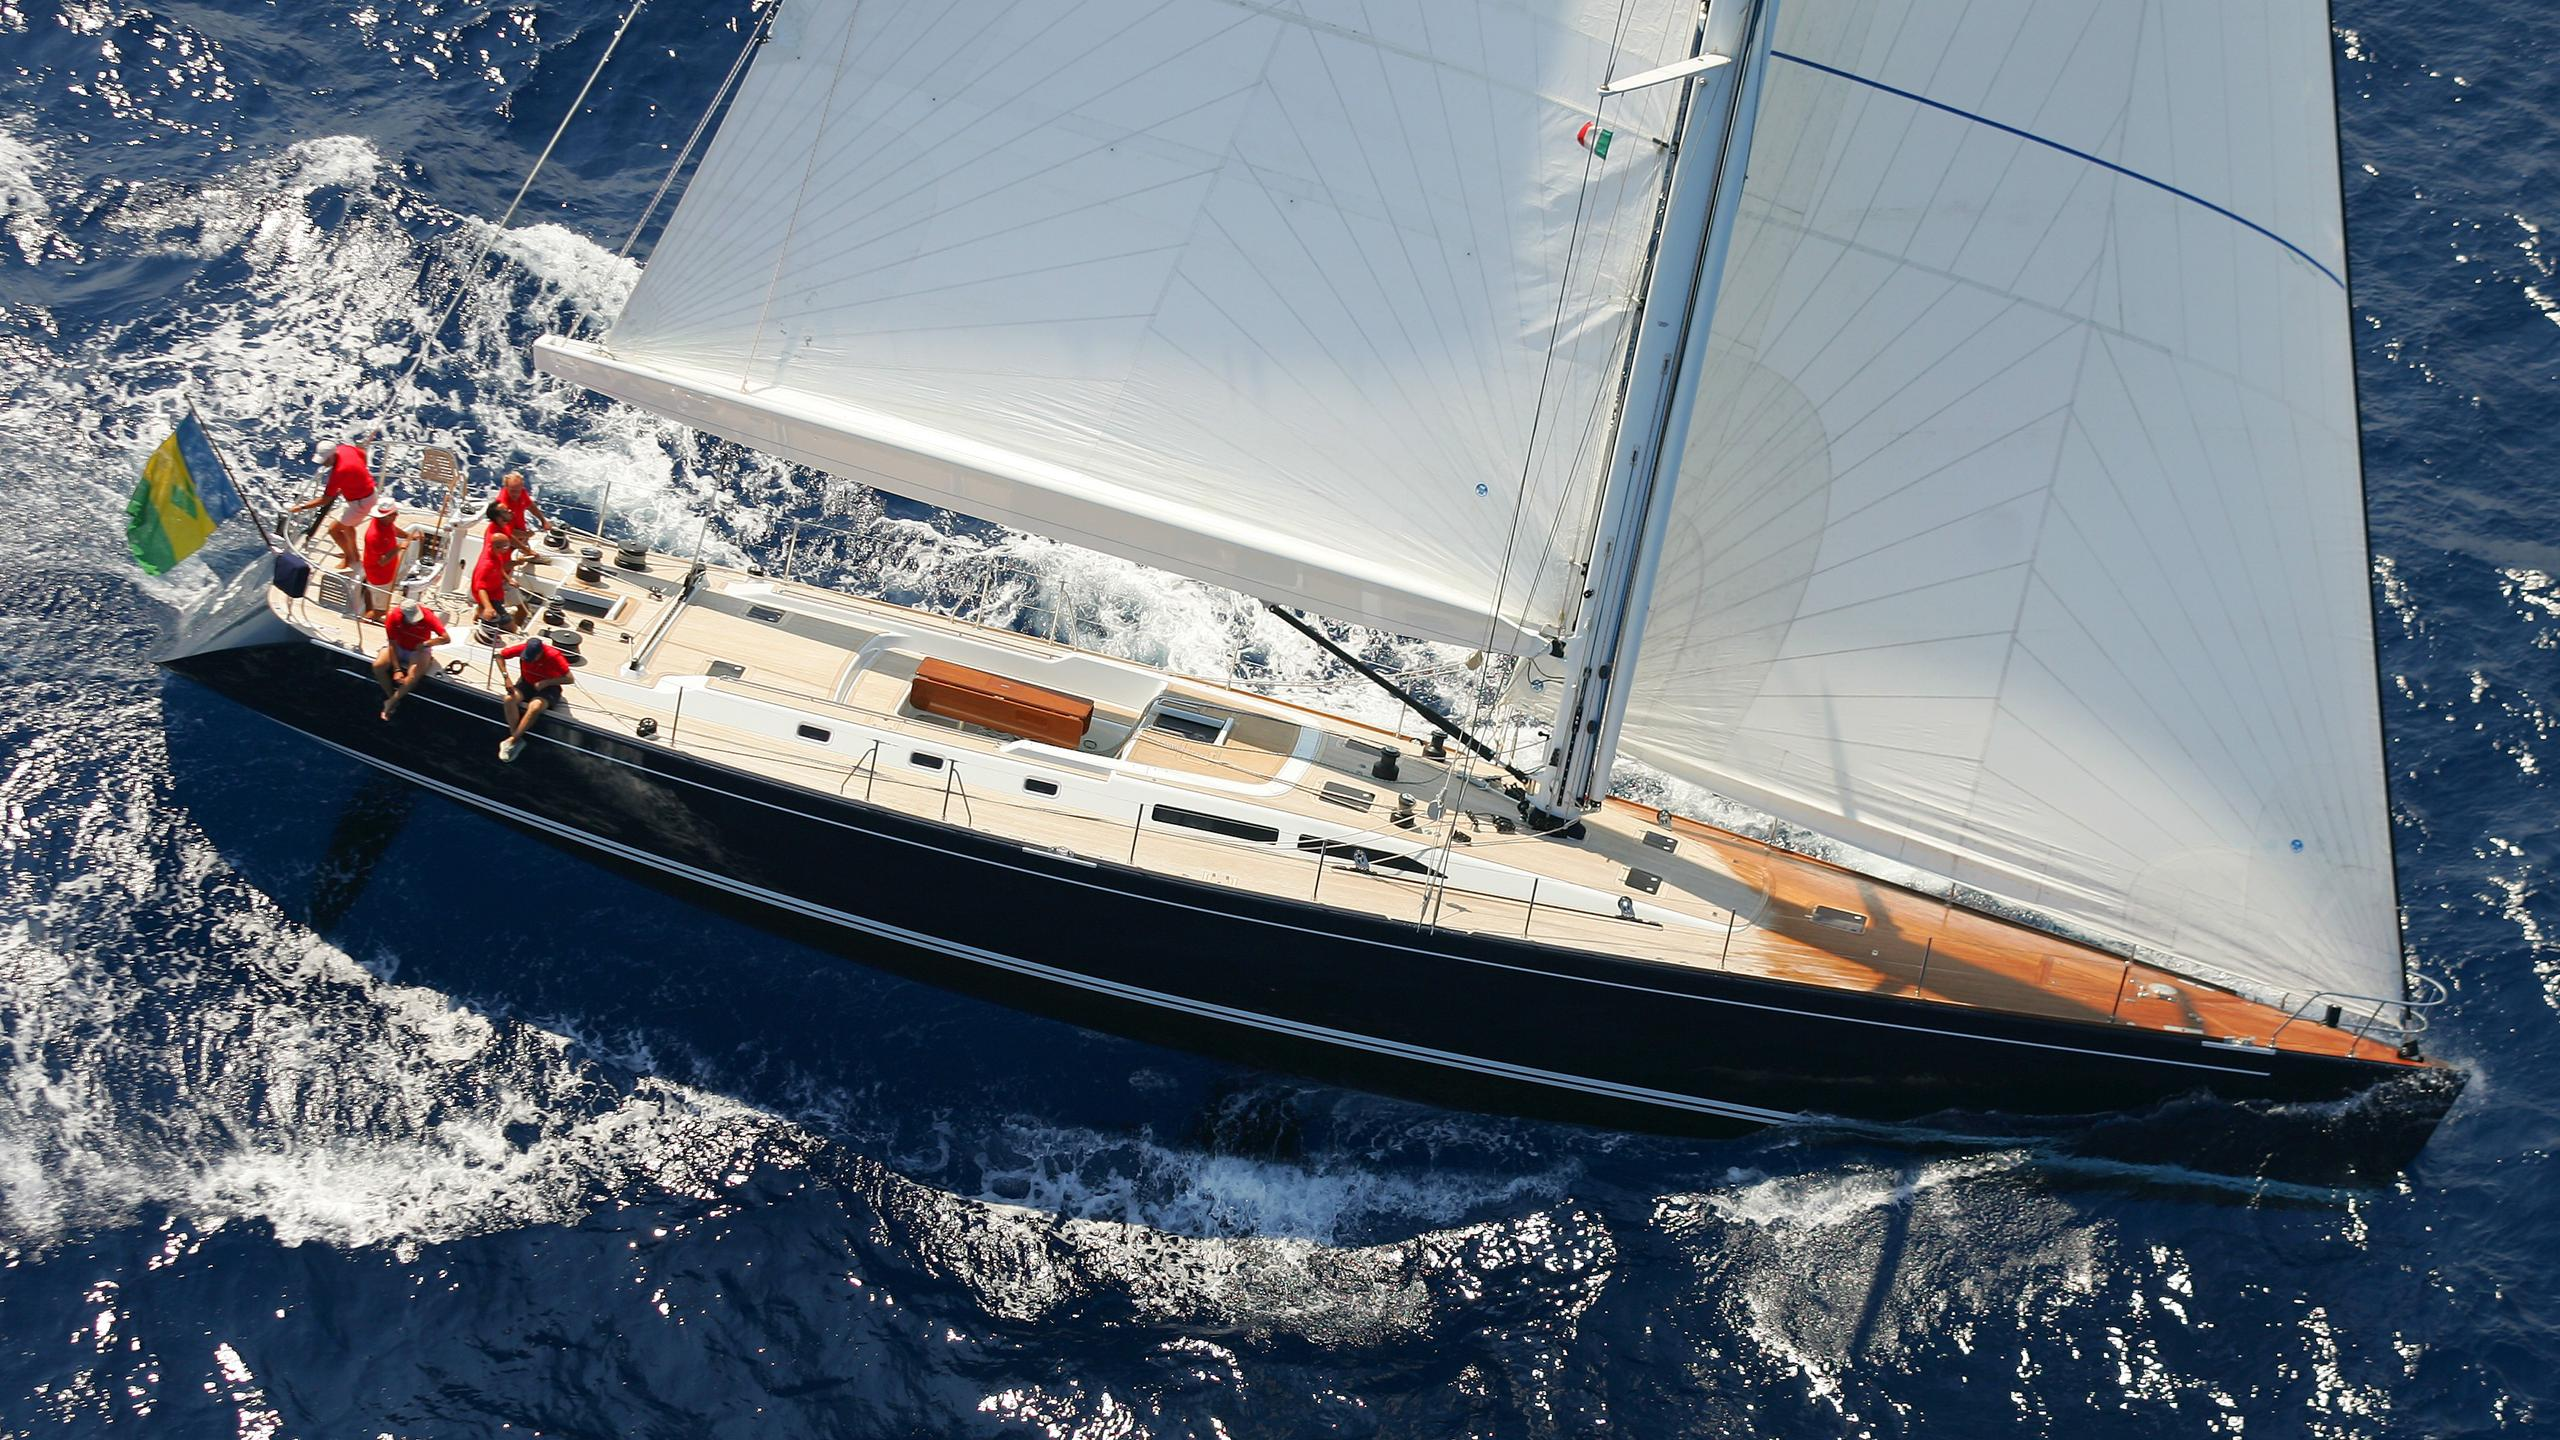 Southern Star sailing yacht